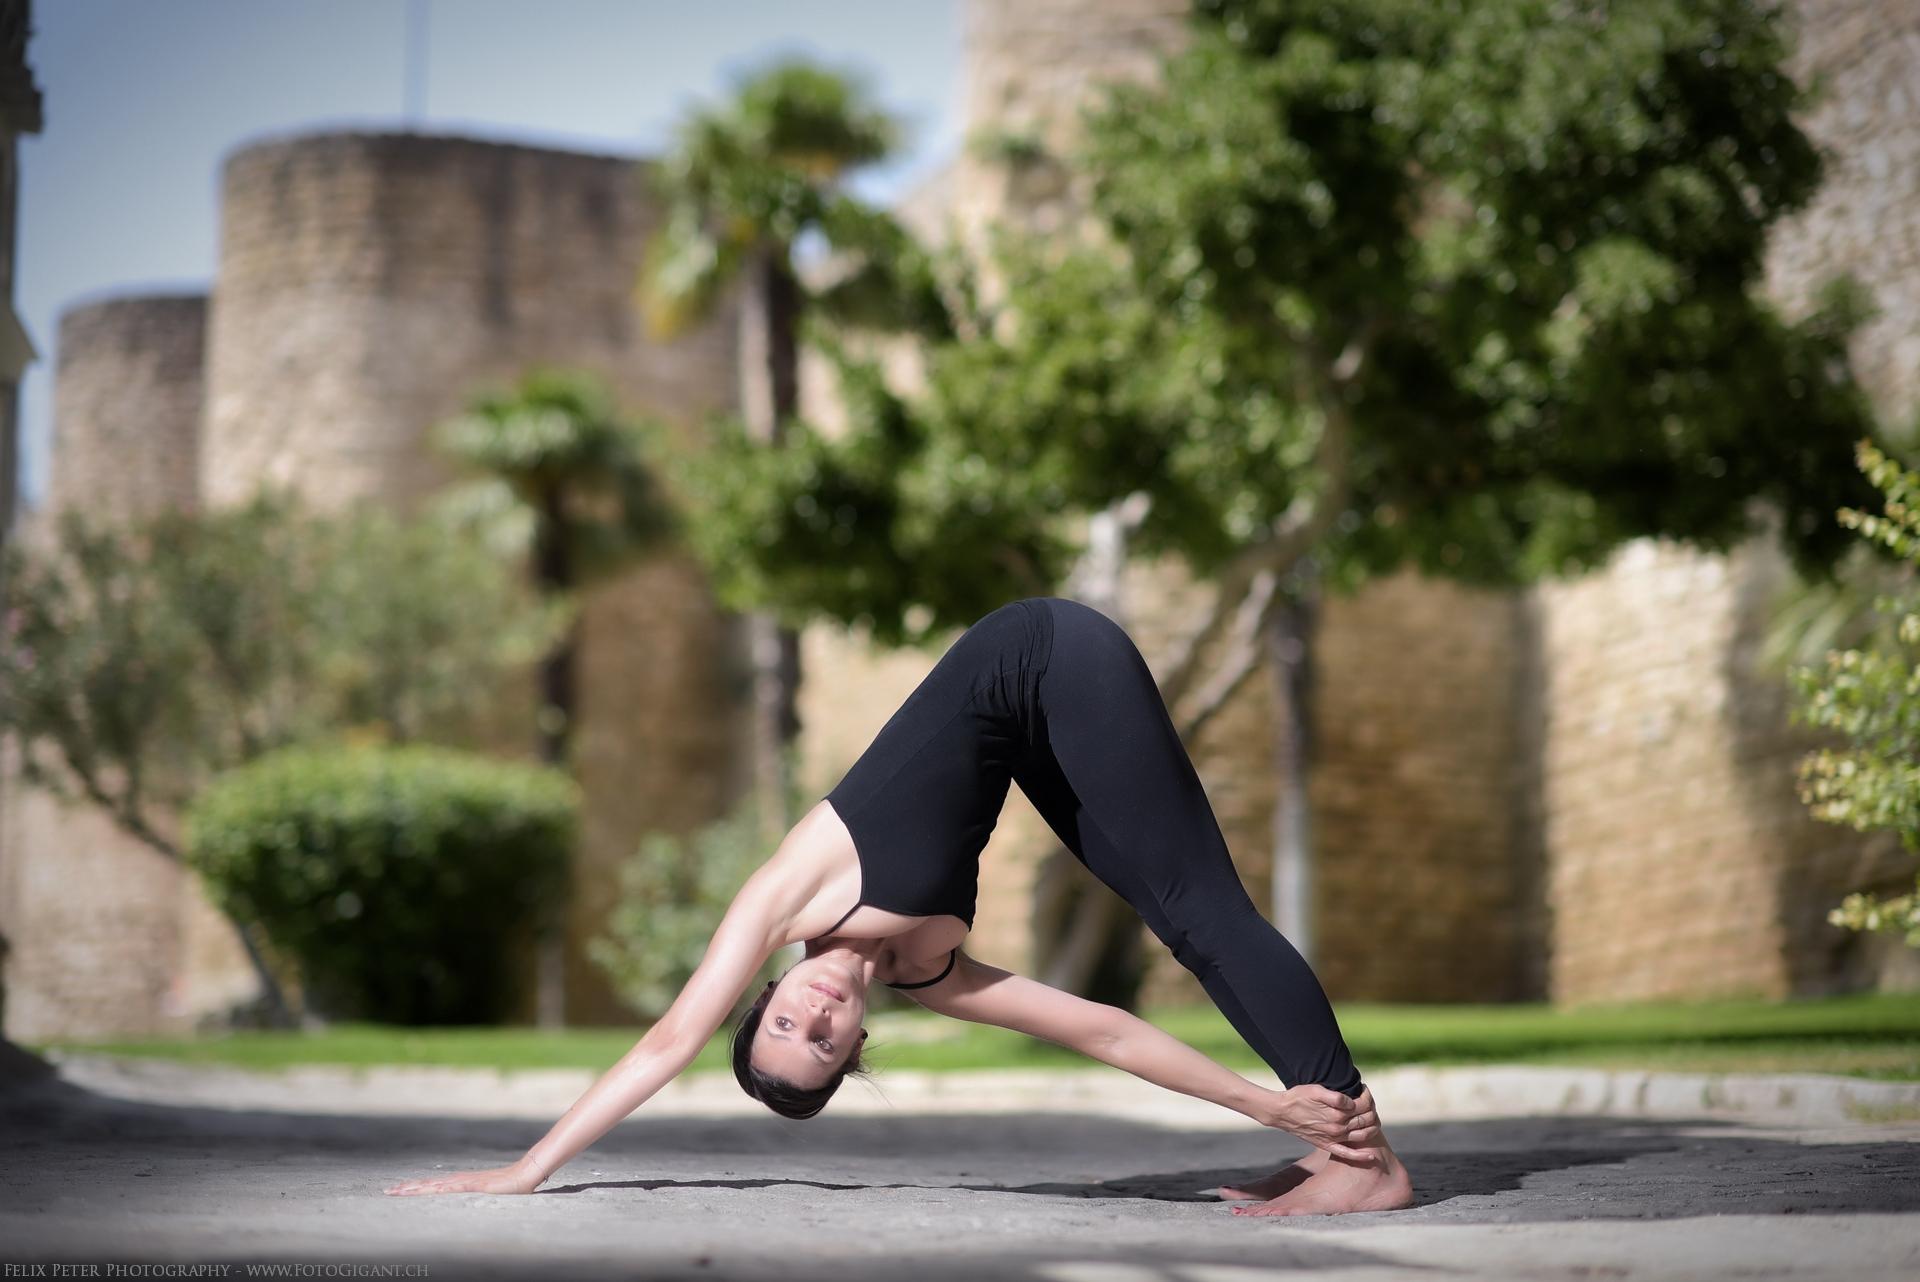 Felix-Peter-Yoga-Pilates-Dance-Fotografie_Bern_121.jpg